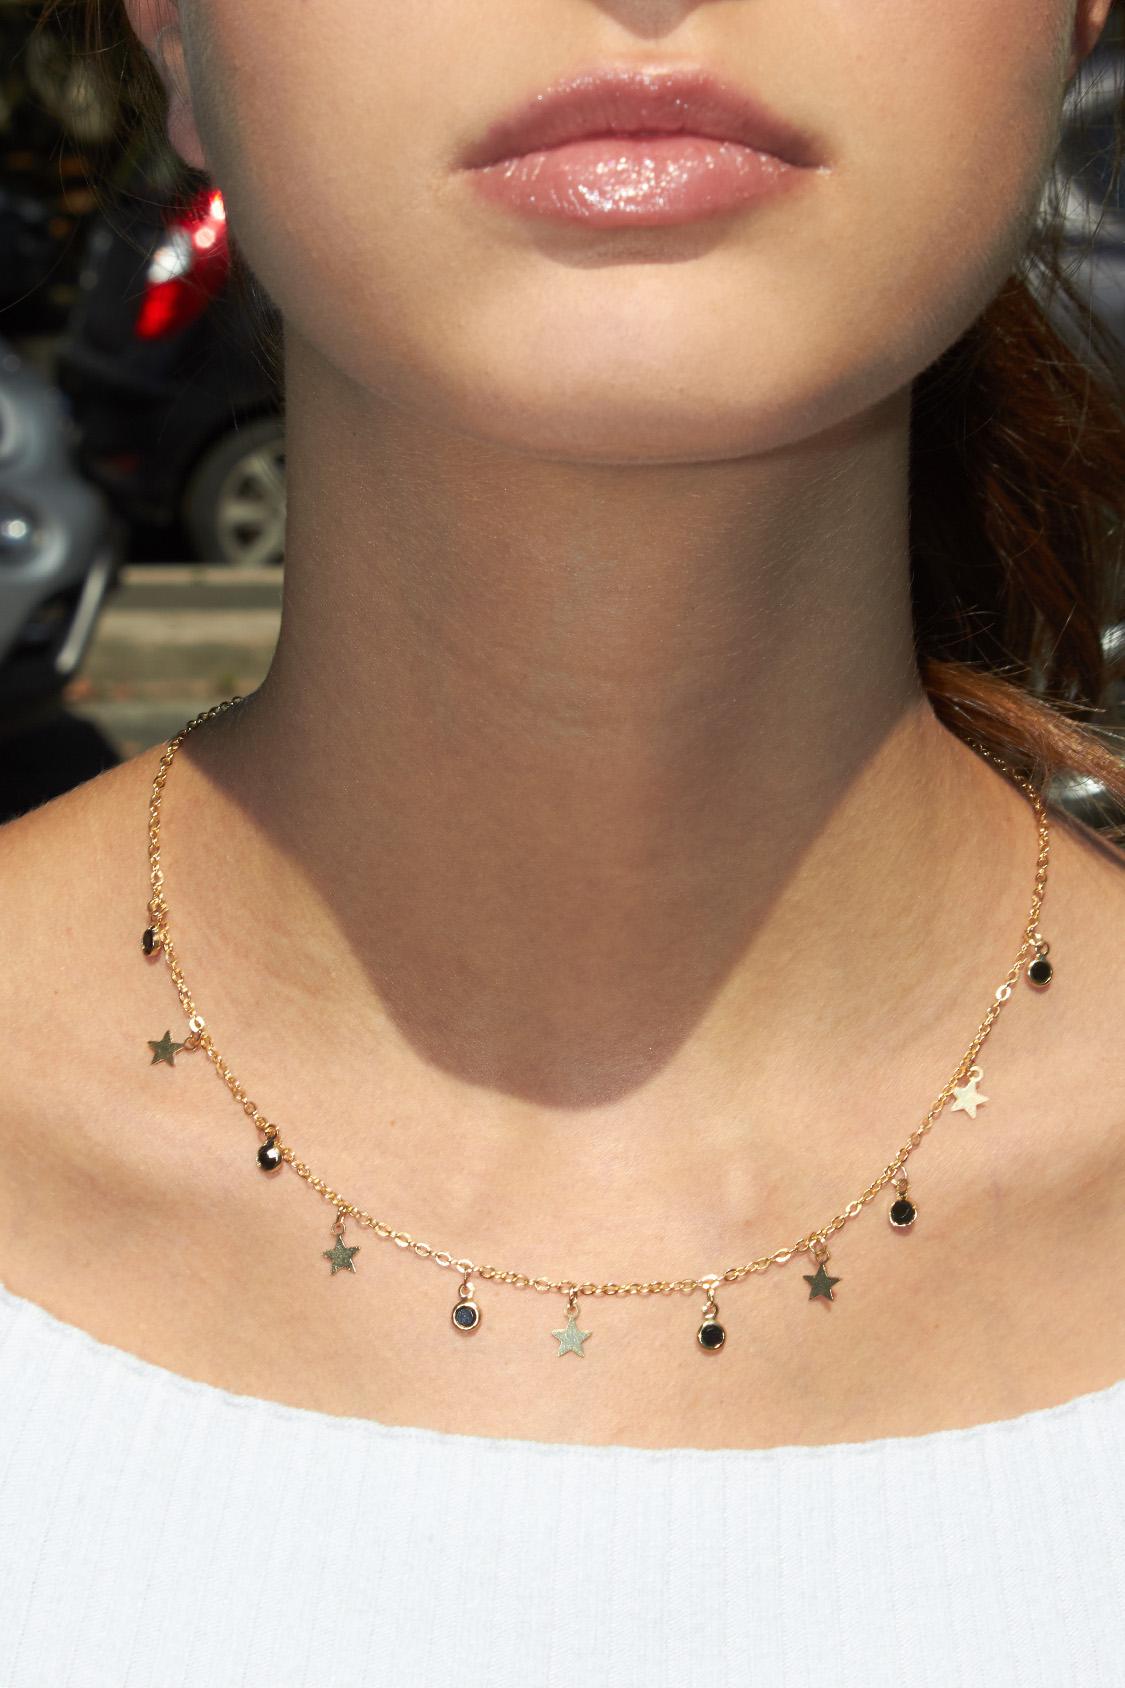 Stones & stars necklace